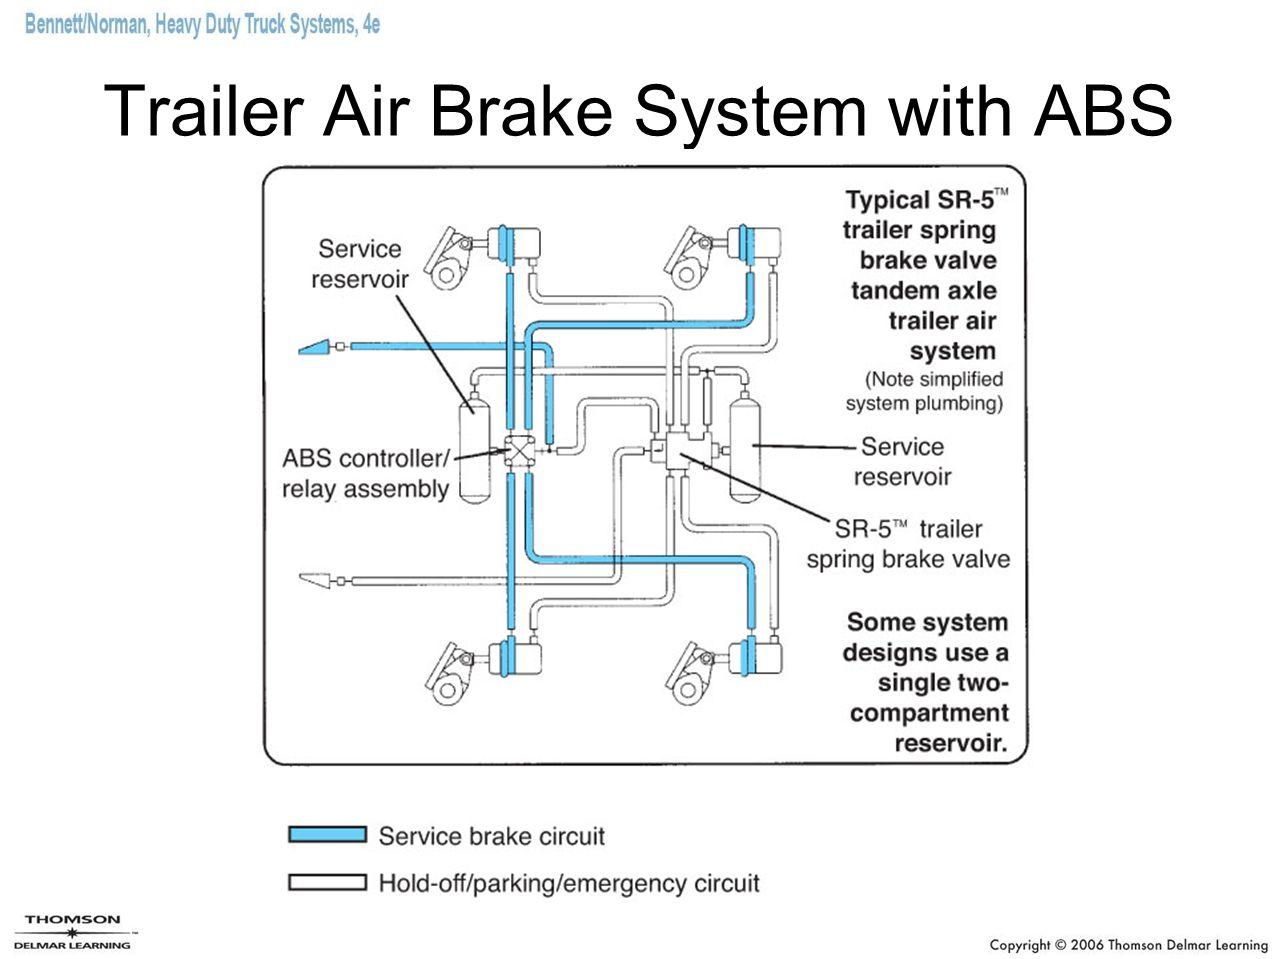 Trailer Air Brake Schematic : Towmaster trailer wiring diagram east